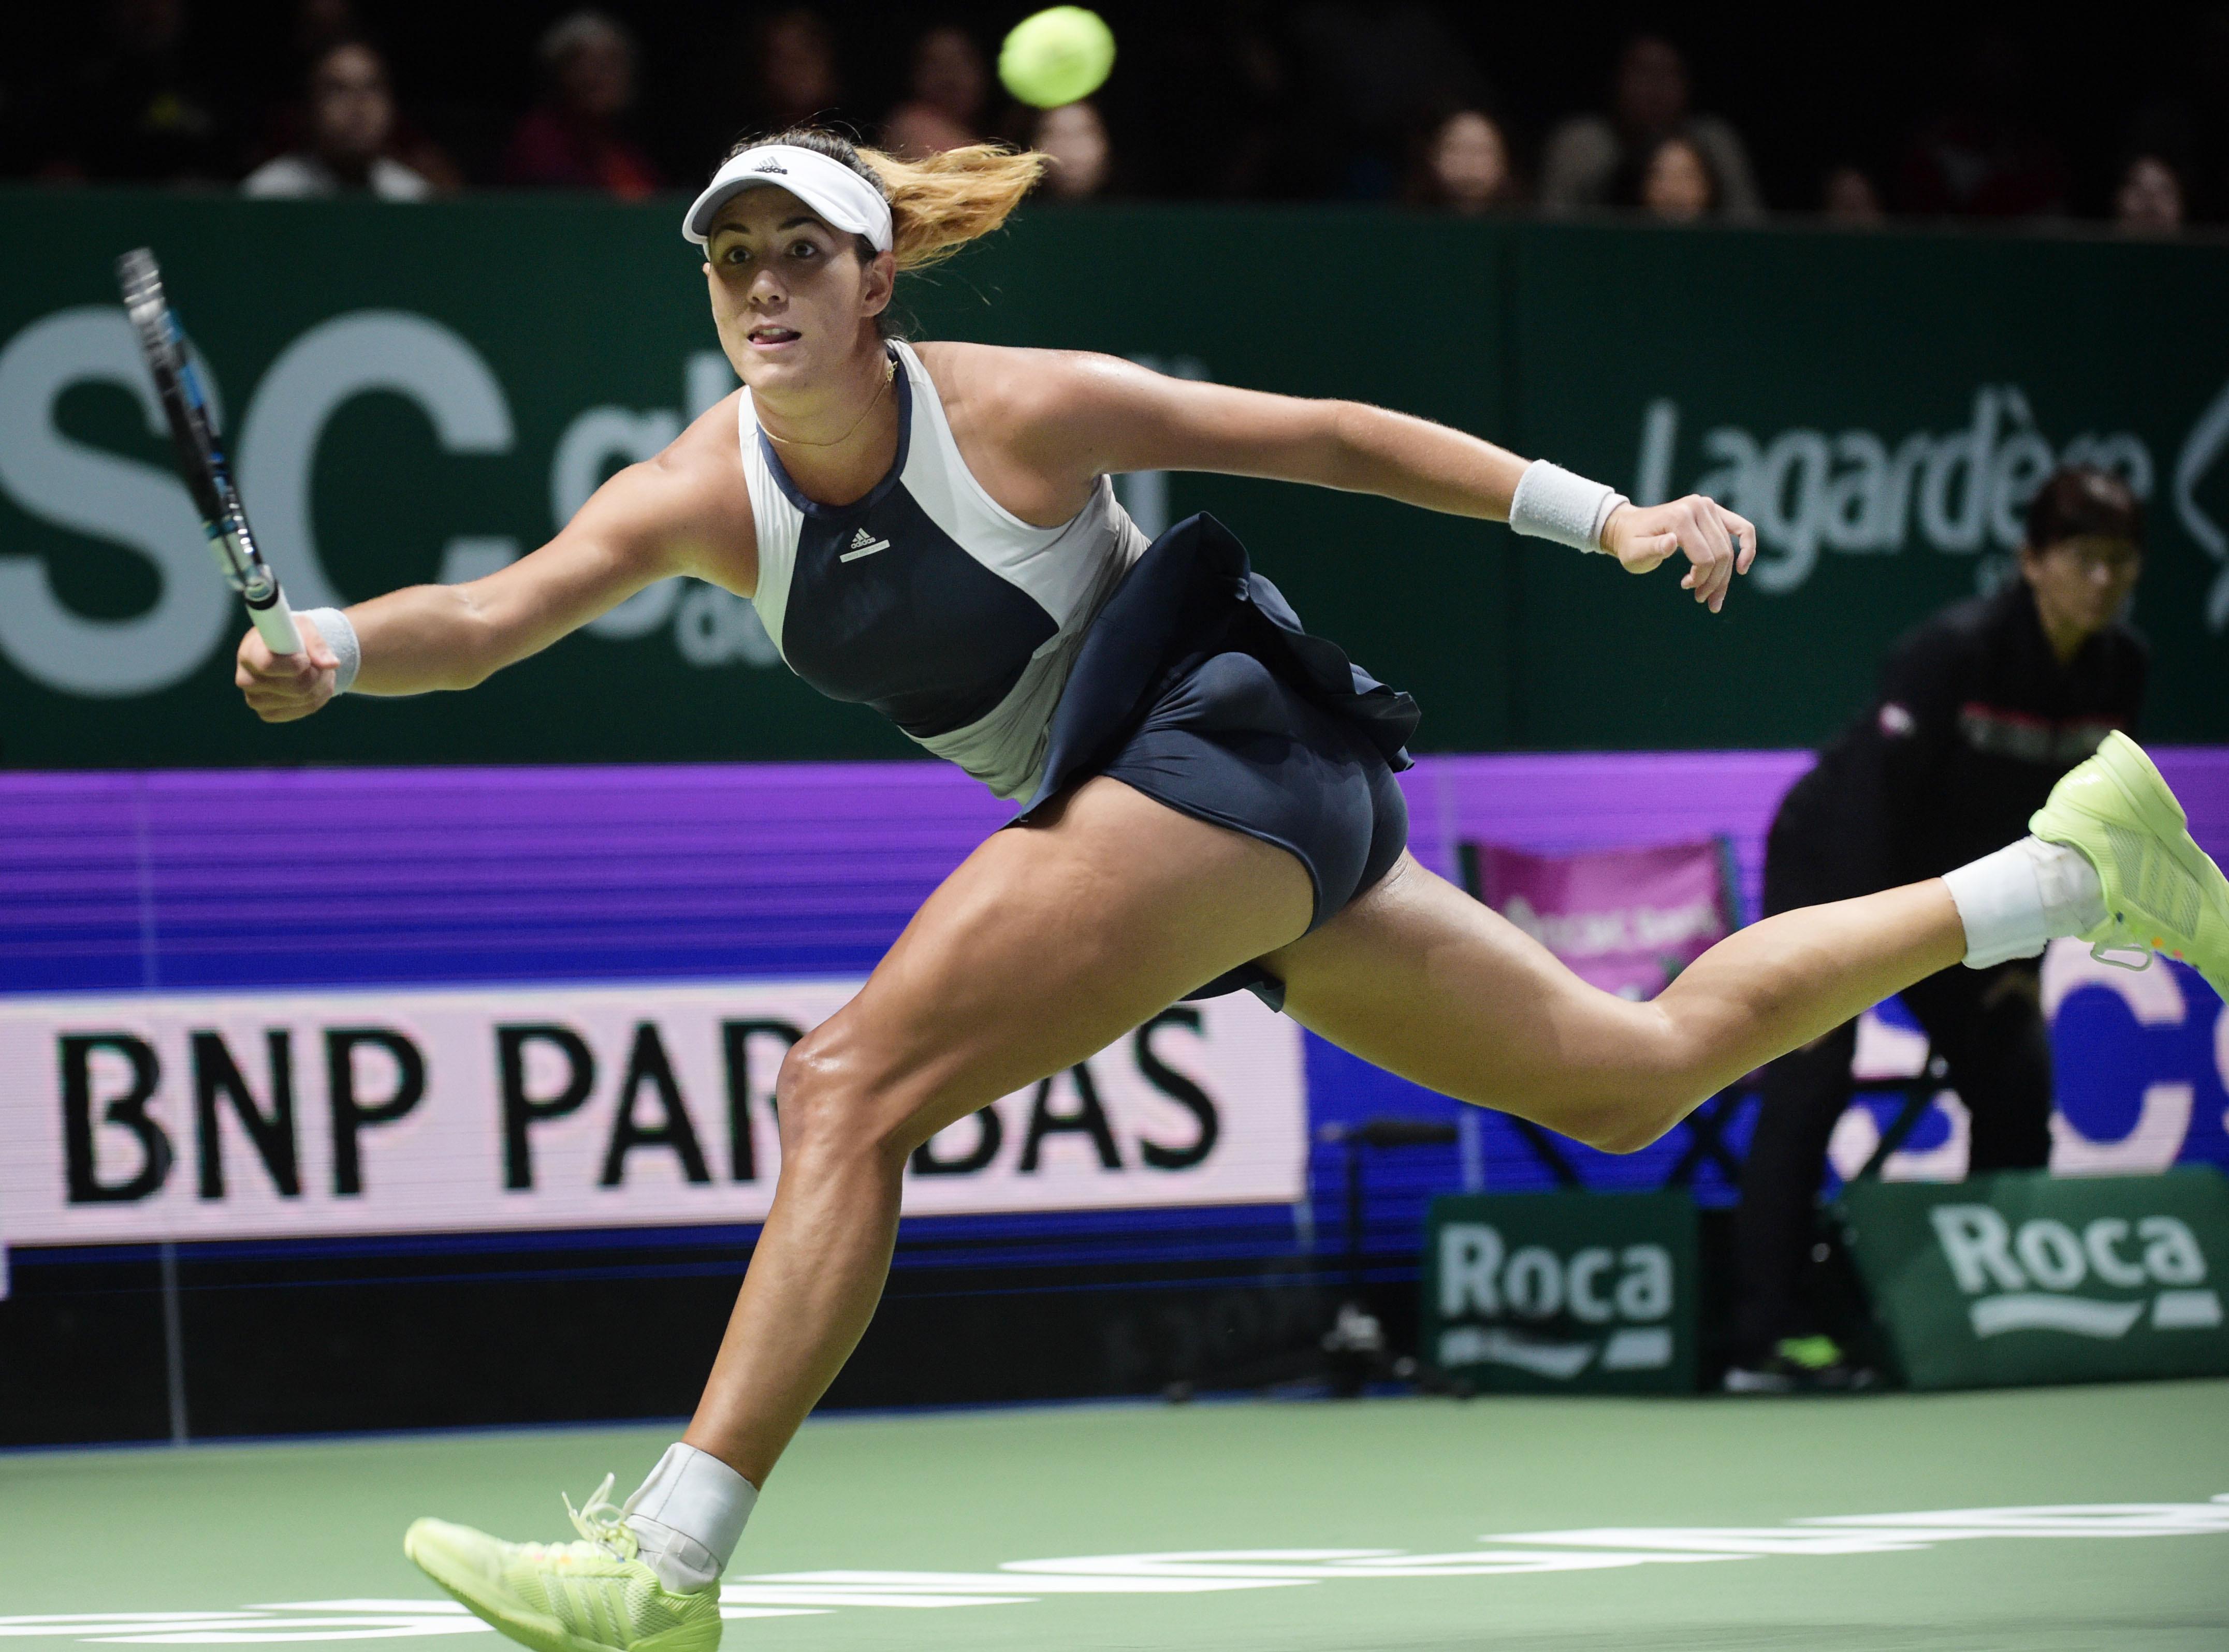 Garbine Muguruza of Spain makes a forehand return against Petra Kvitova of the Czech Republic during their singles match at the WTA tennis finals in Singapore on Friday, Oct. 30, 2015.  (AP Photo/Joseph Nair)